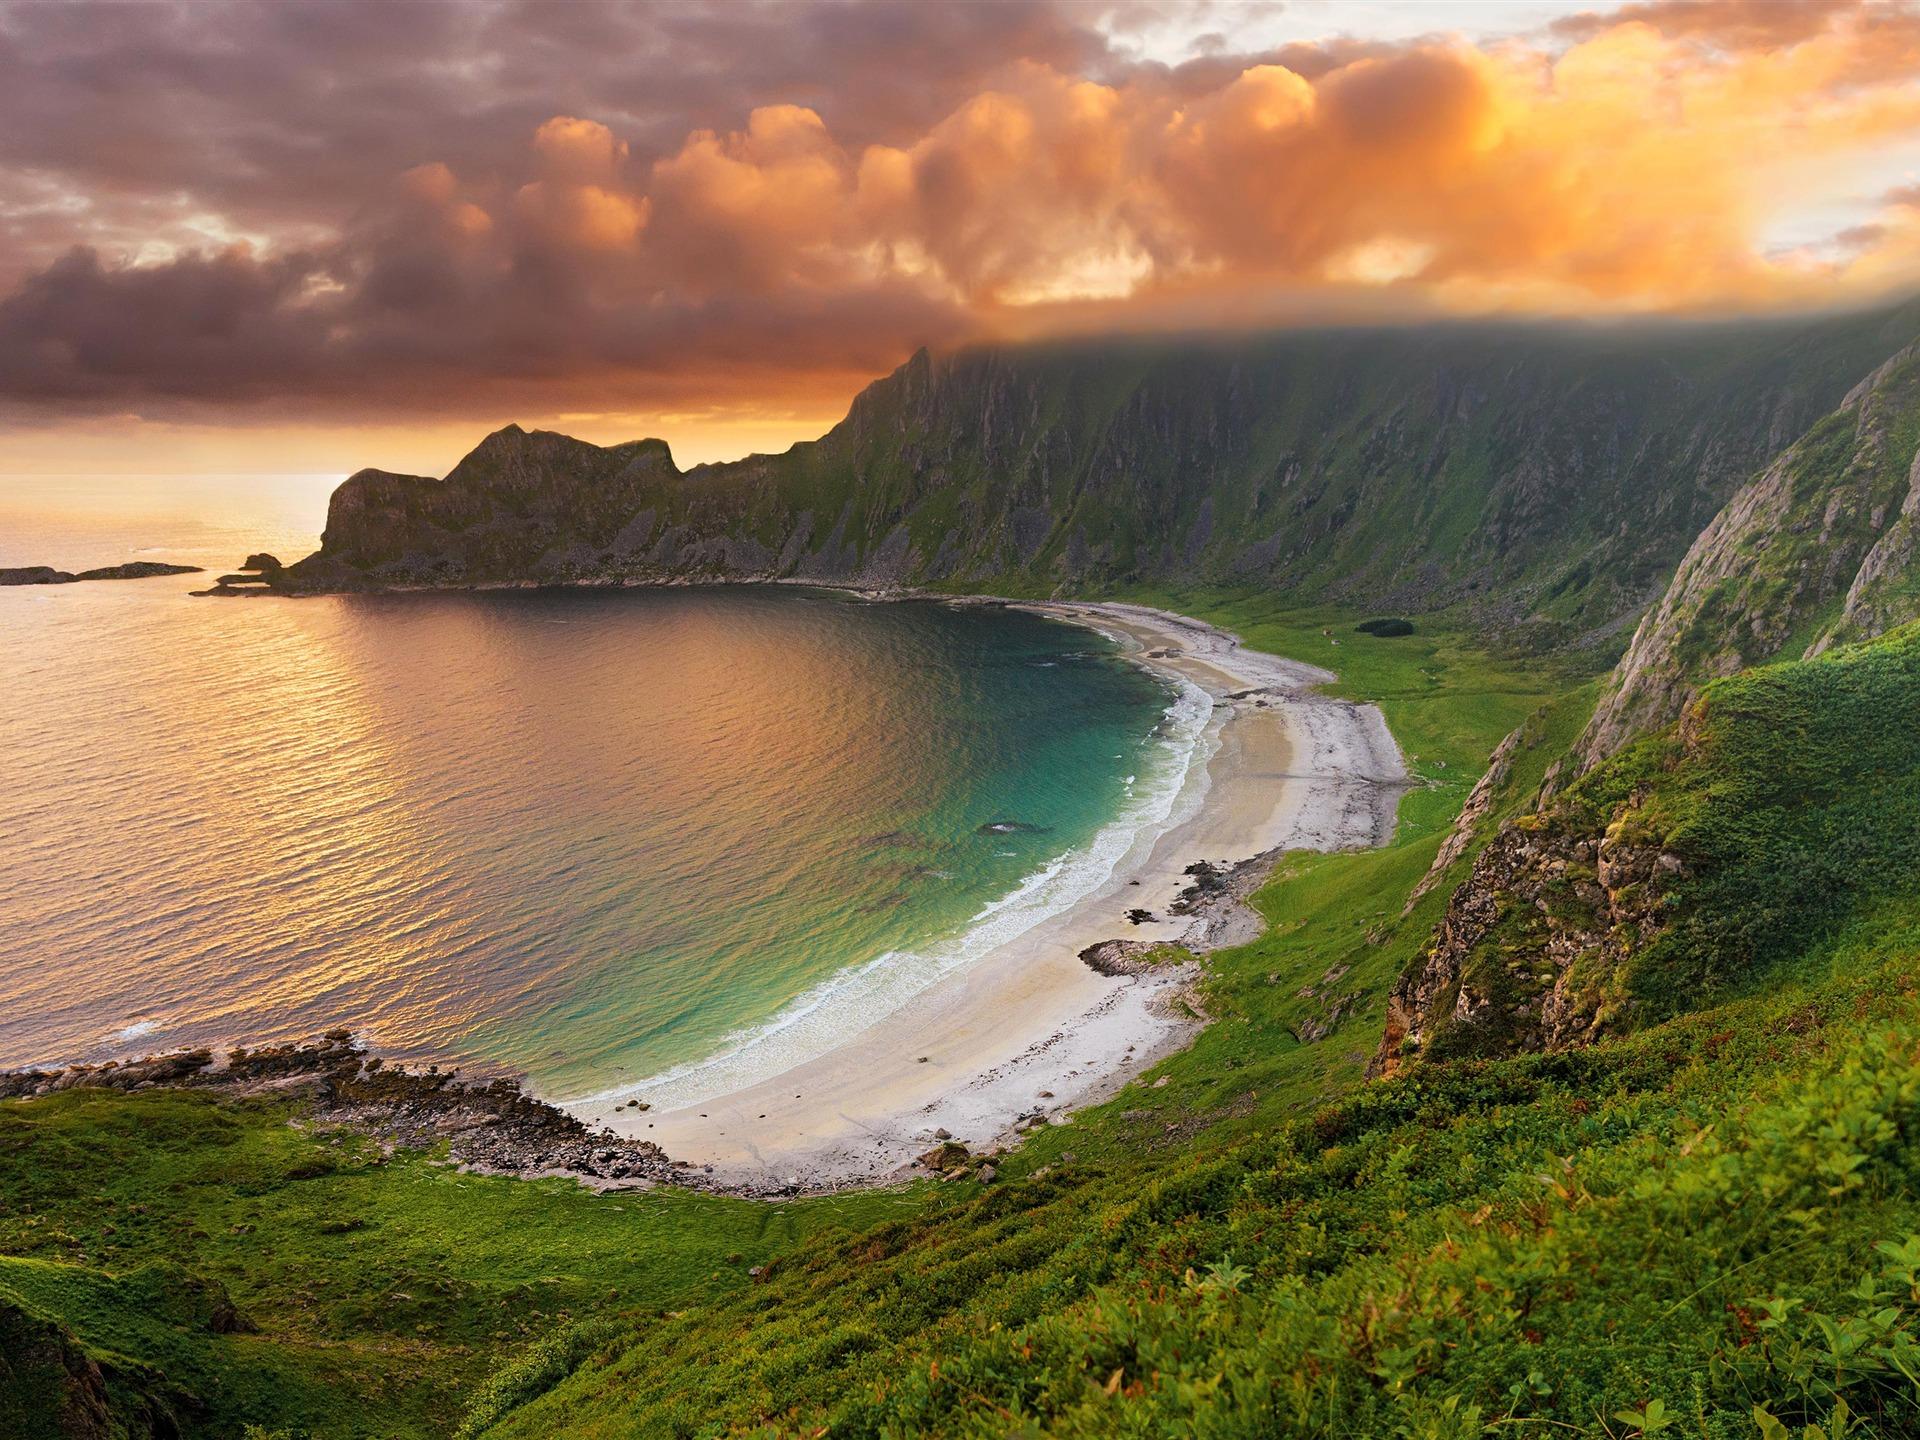 Retina Wallpaper Beach Sea Hd Desktop Wallpapers: Mer, Baie, Plage, Falaises, IMac, Retina, 4K, Ultra HD